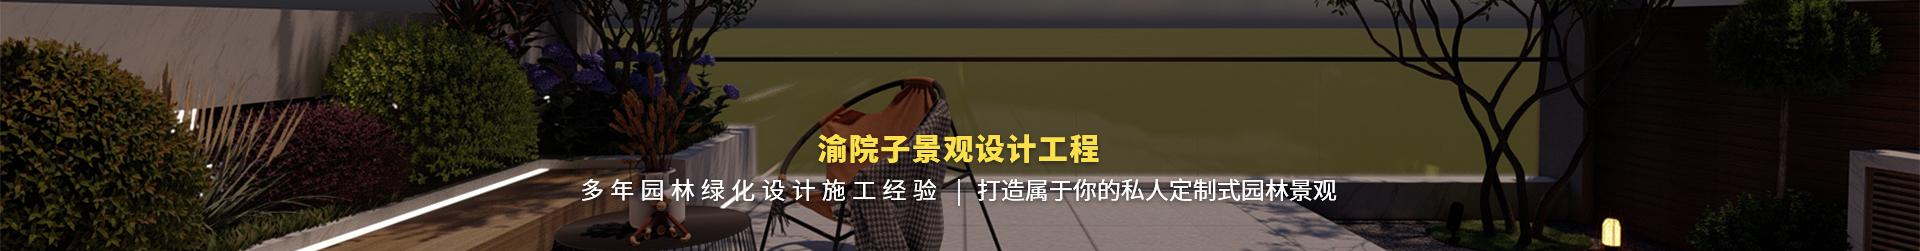 http://www.cqyuanzi.com/data/upload/202104/20210425145612_739.jpg